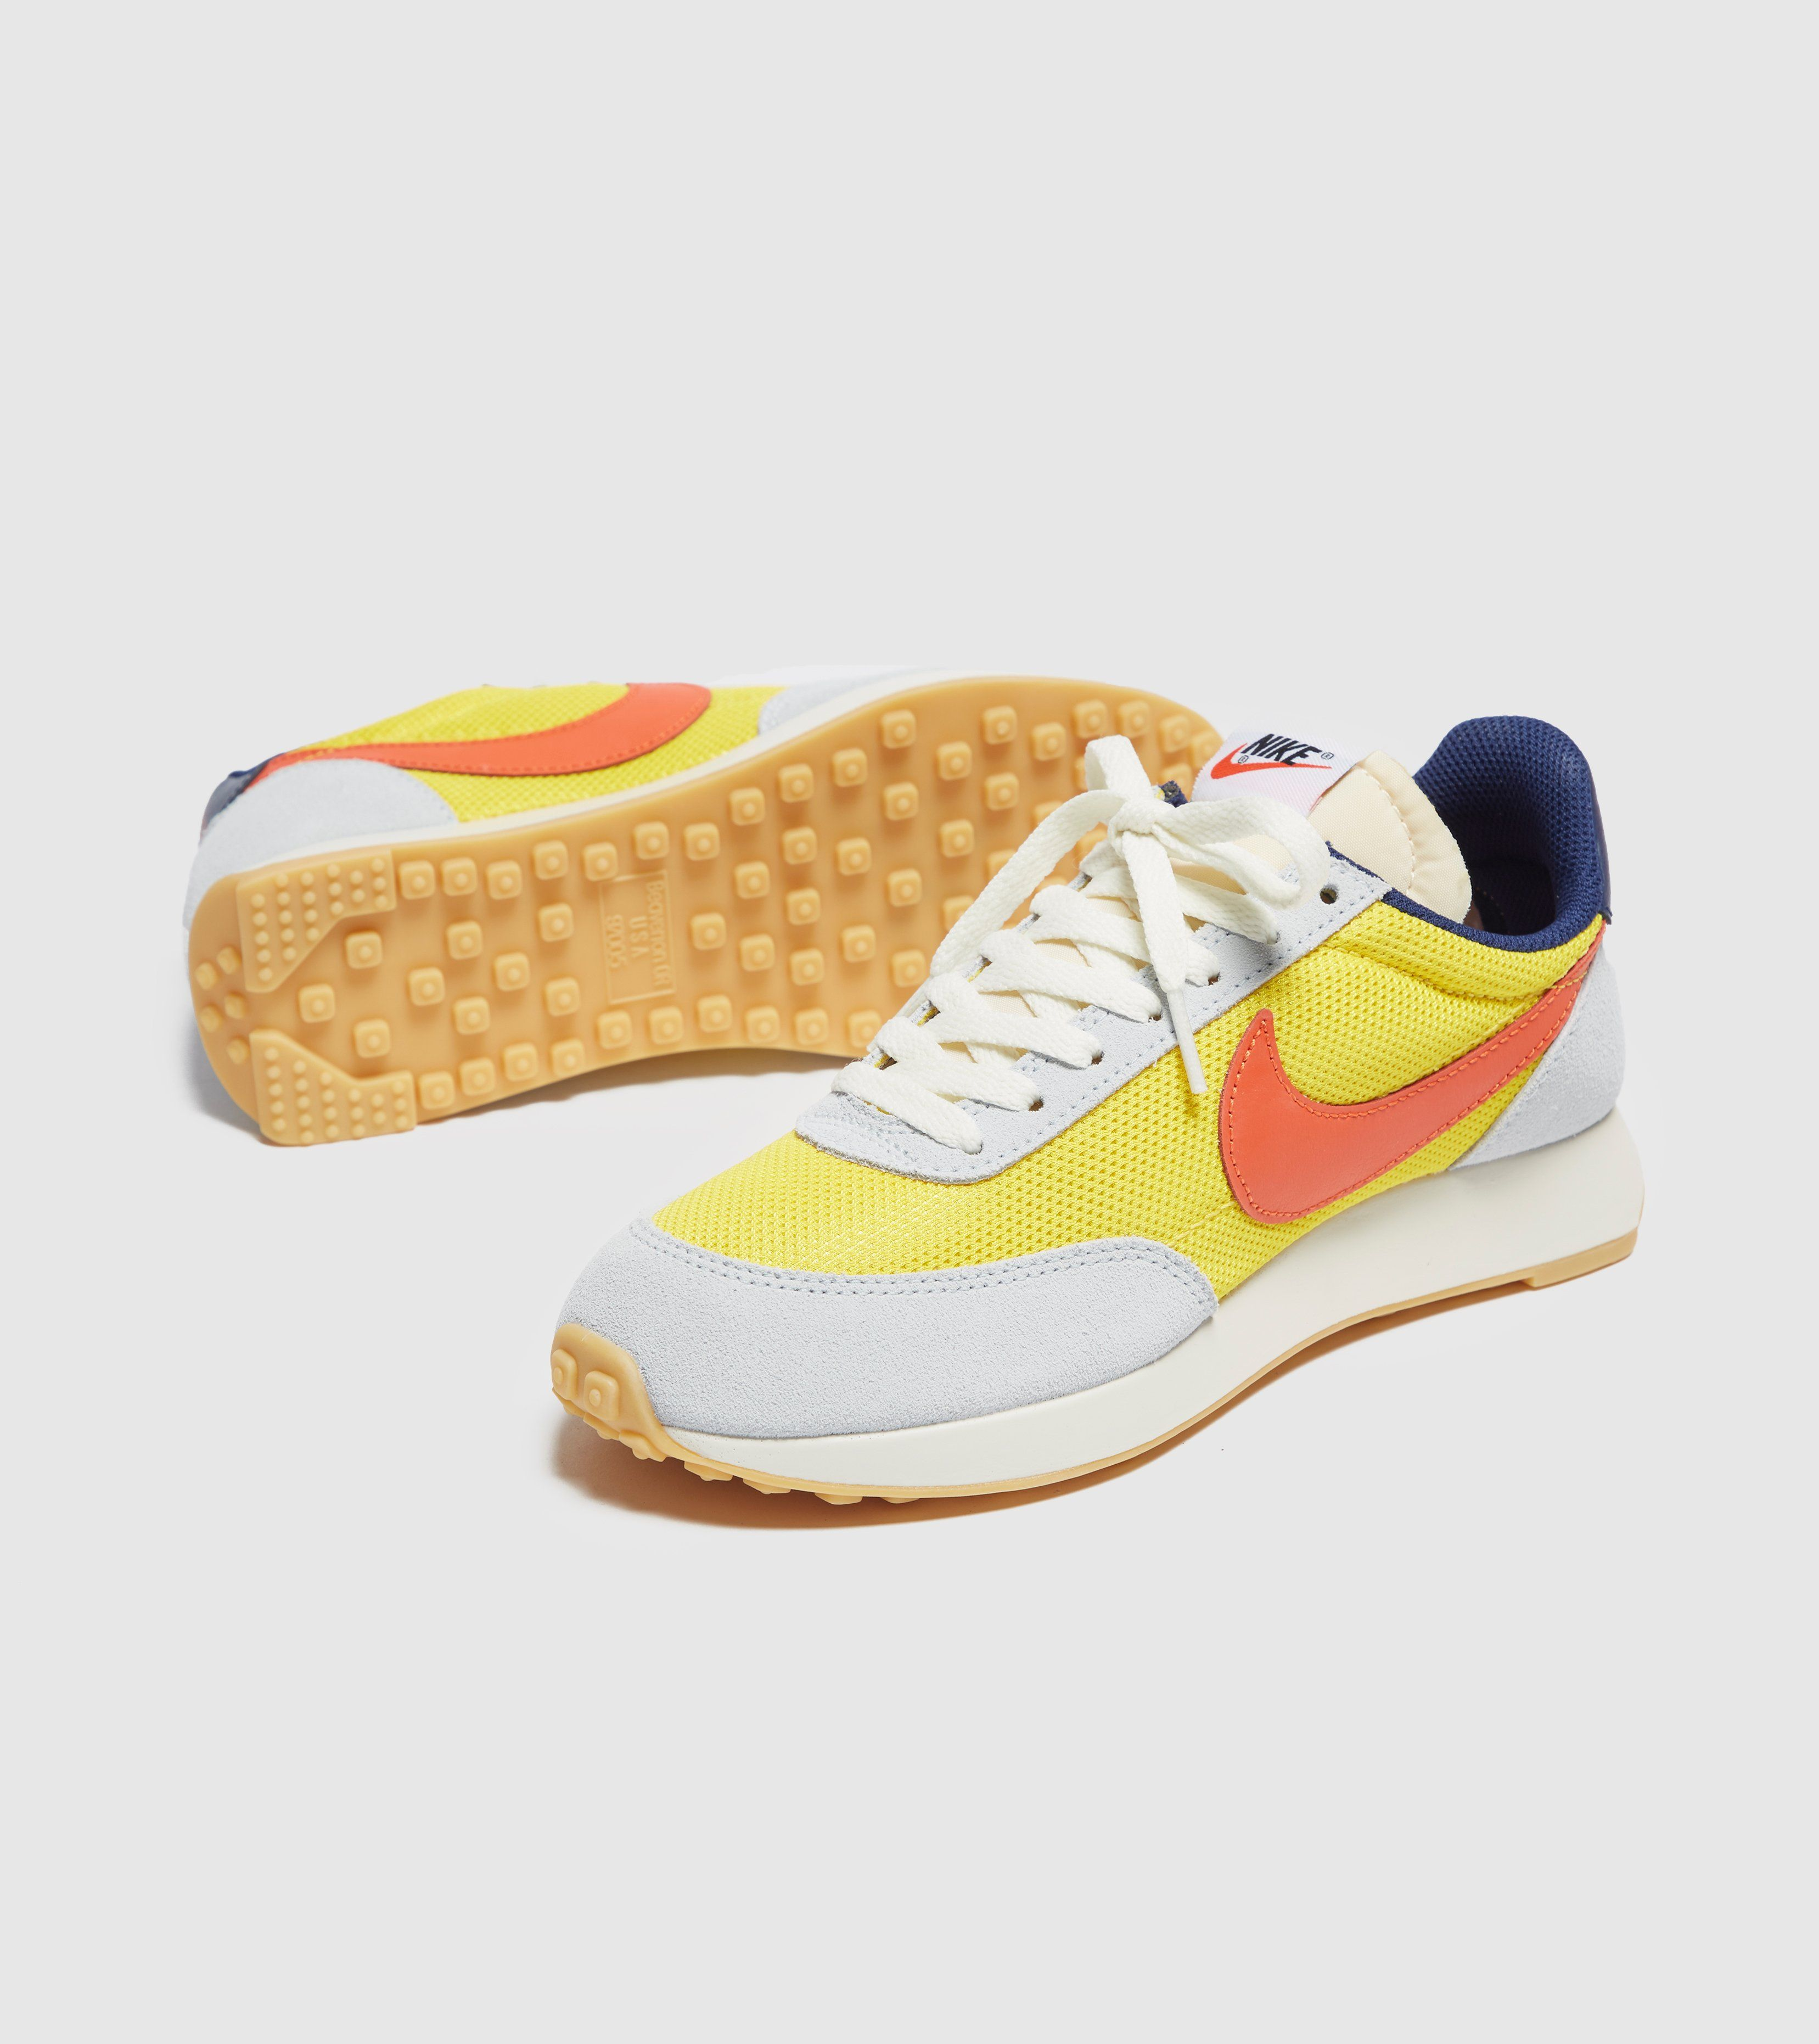 Nike Air Tailwind Women's